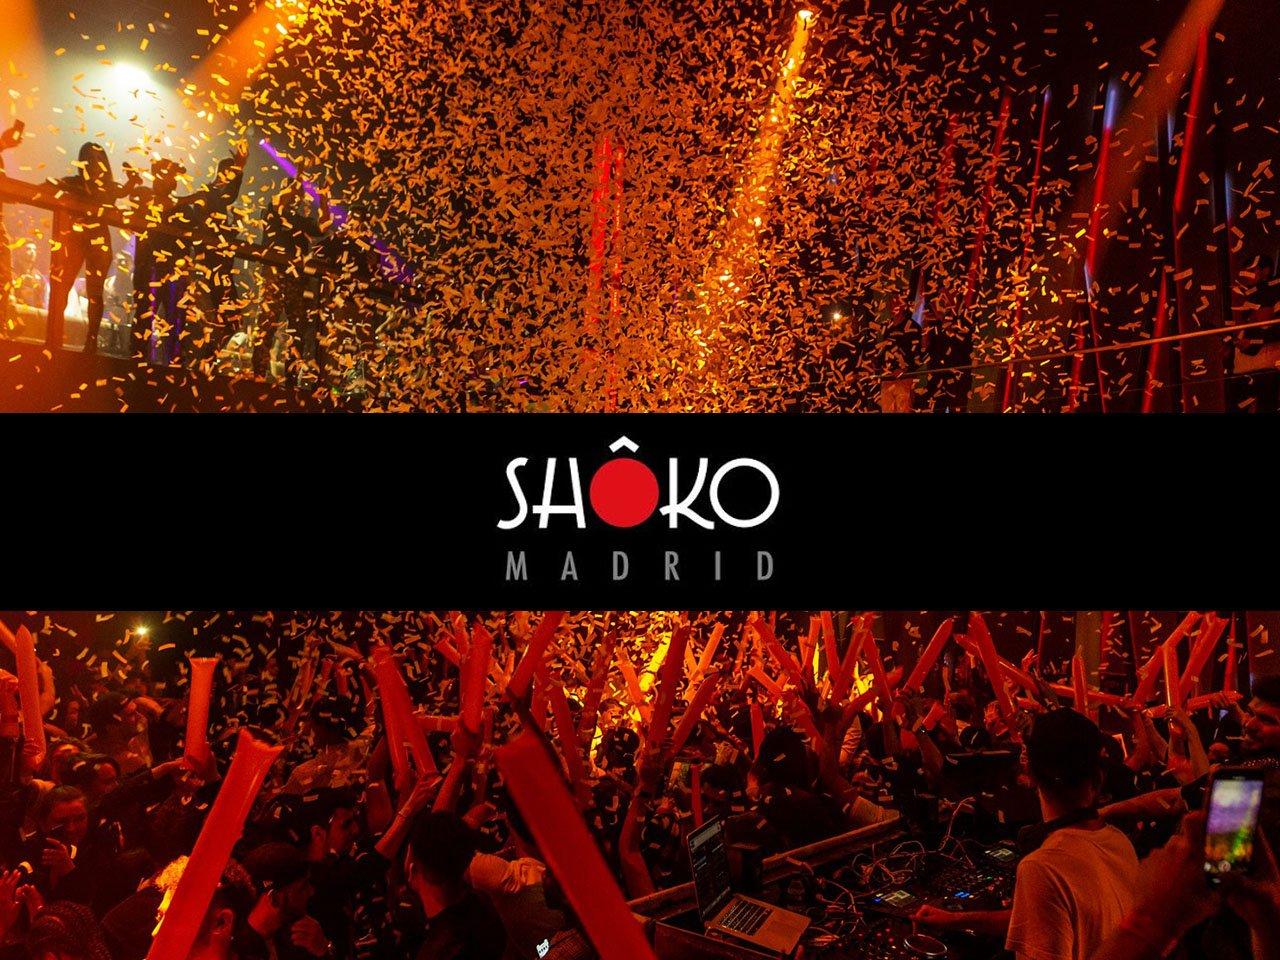 Shoko in Madrid